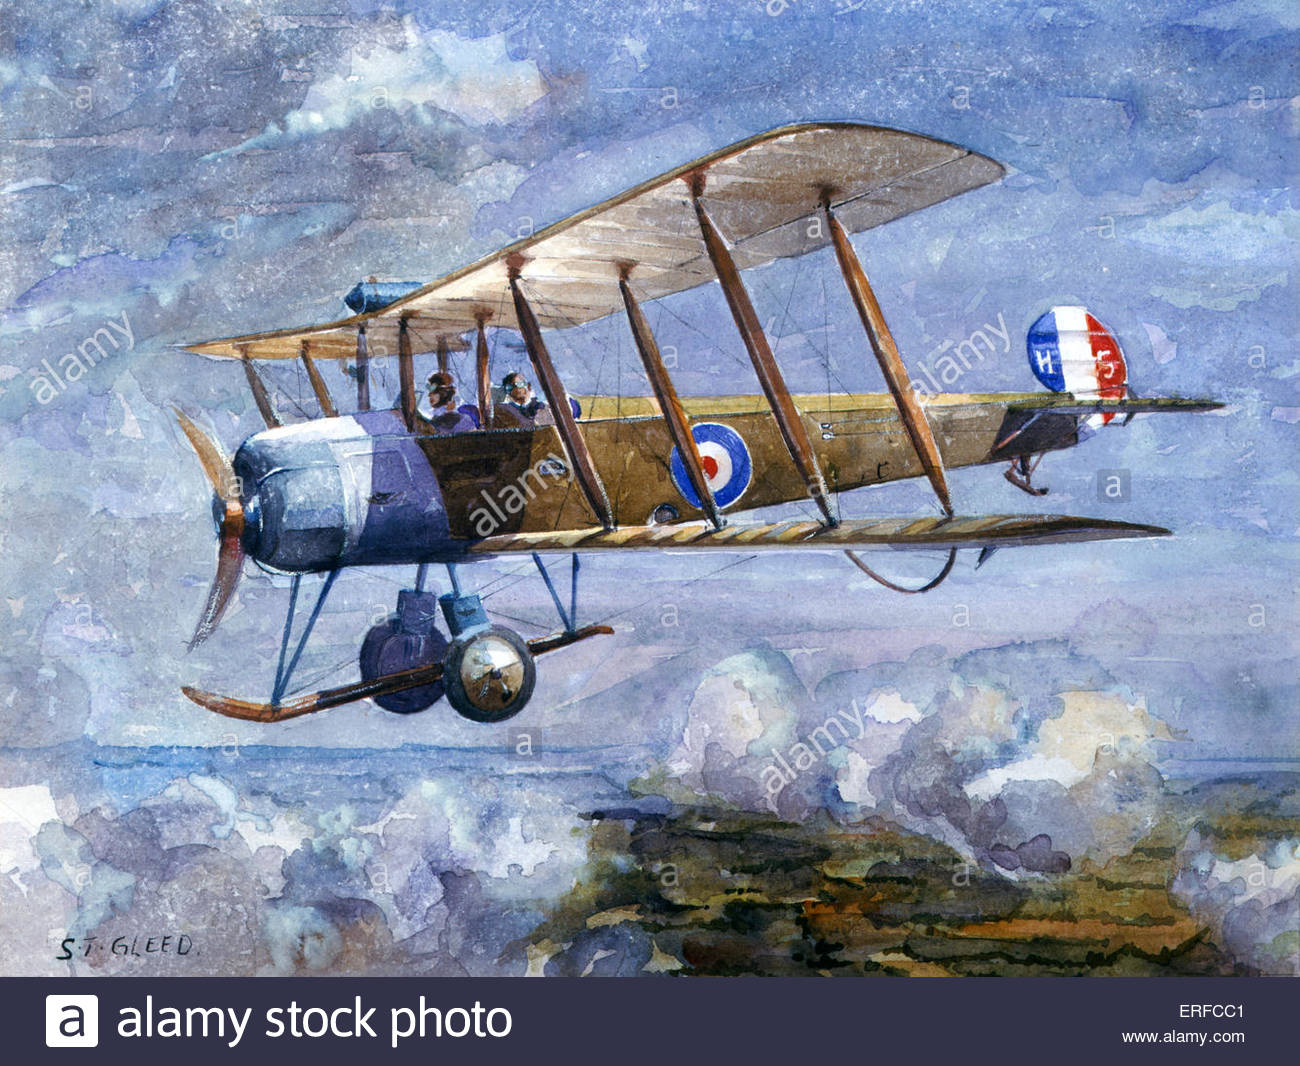 Avro 504 en vol par S G Gleed. Royal Air Force Museum, Hendon Photo Stock